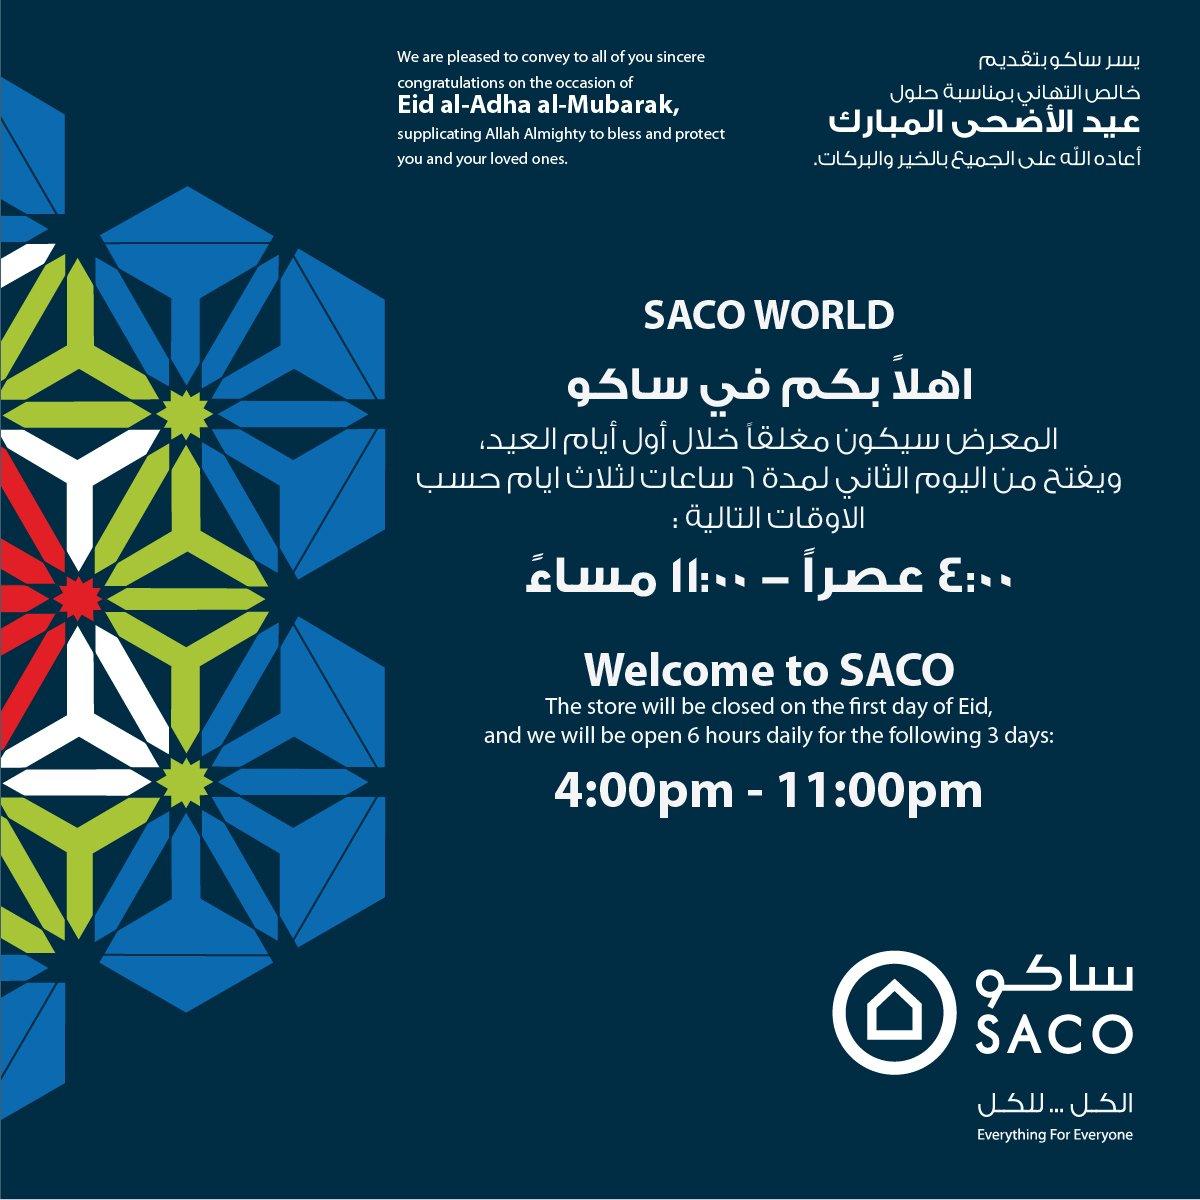 Saco ساكو A Twitter أوقات الدوام في فروع عالم ساكو في جدة الرياض والظهران هذه الاوقات لفروع عالم ساكو فقط الكل للكل